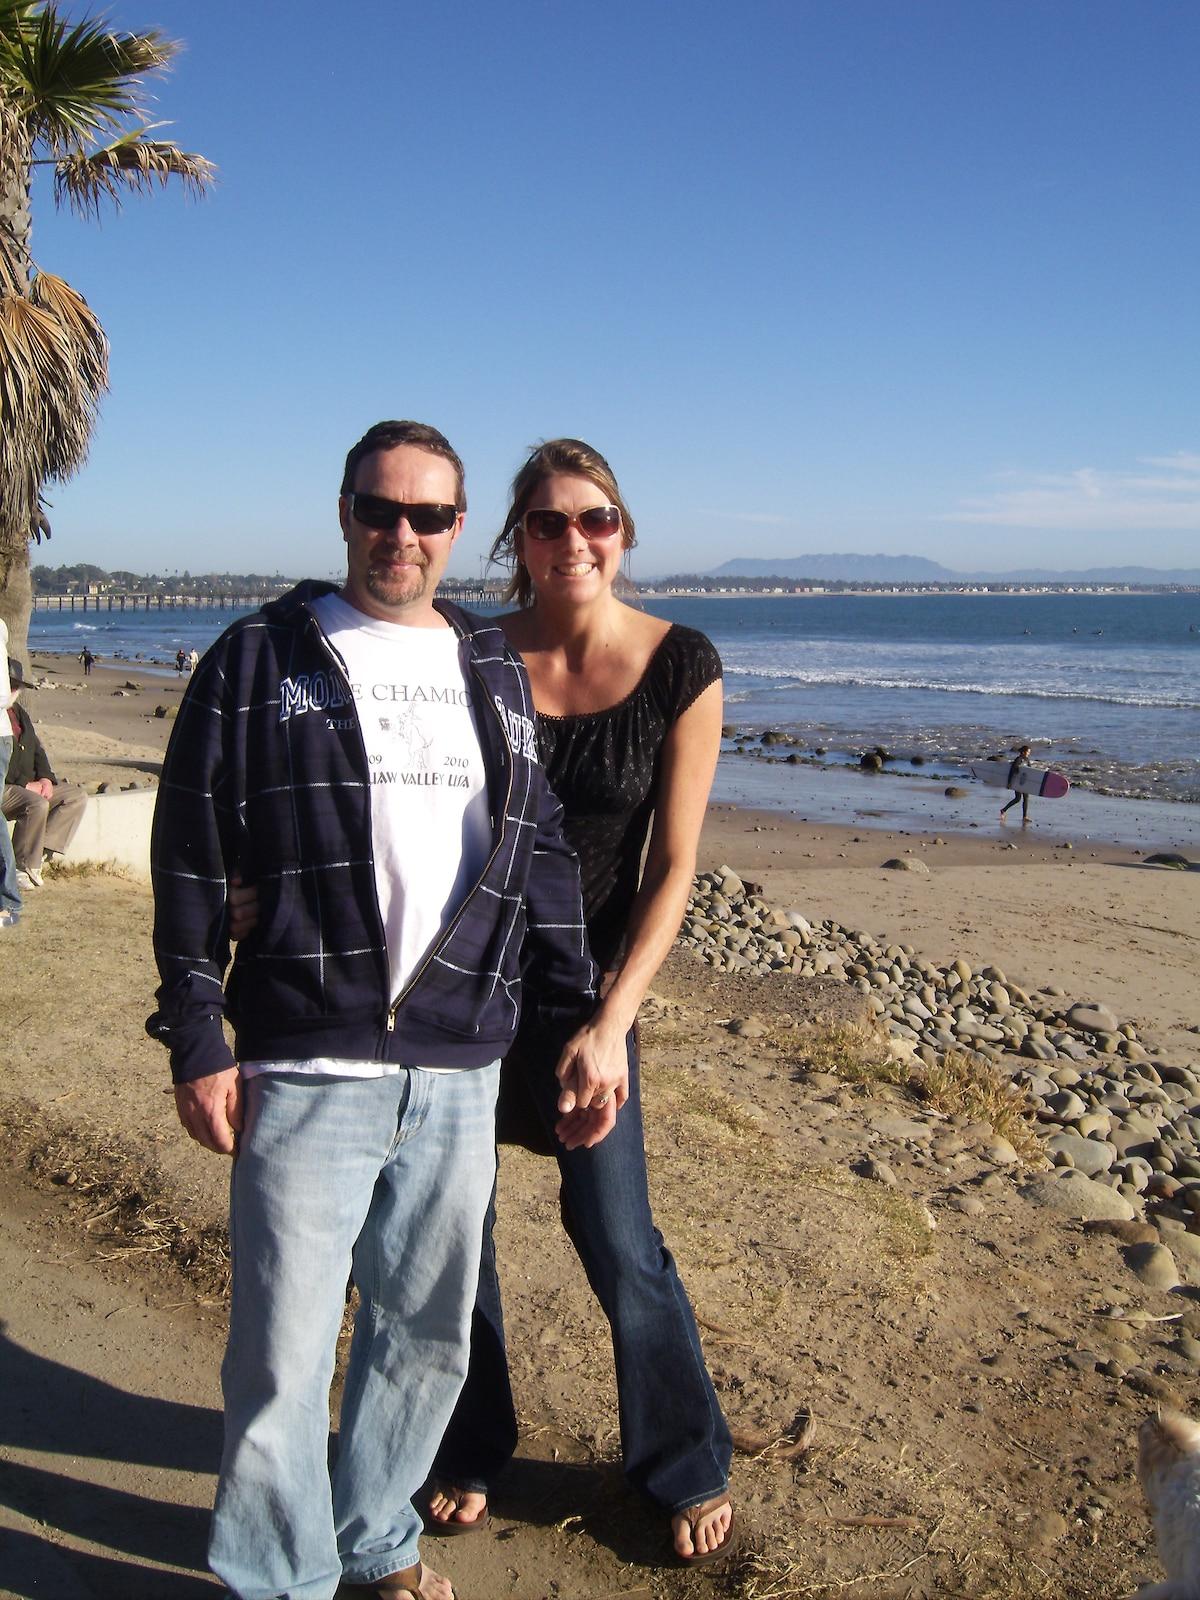 Suzi And Scott from Carnelian Bay